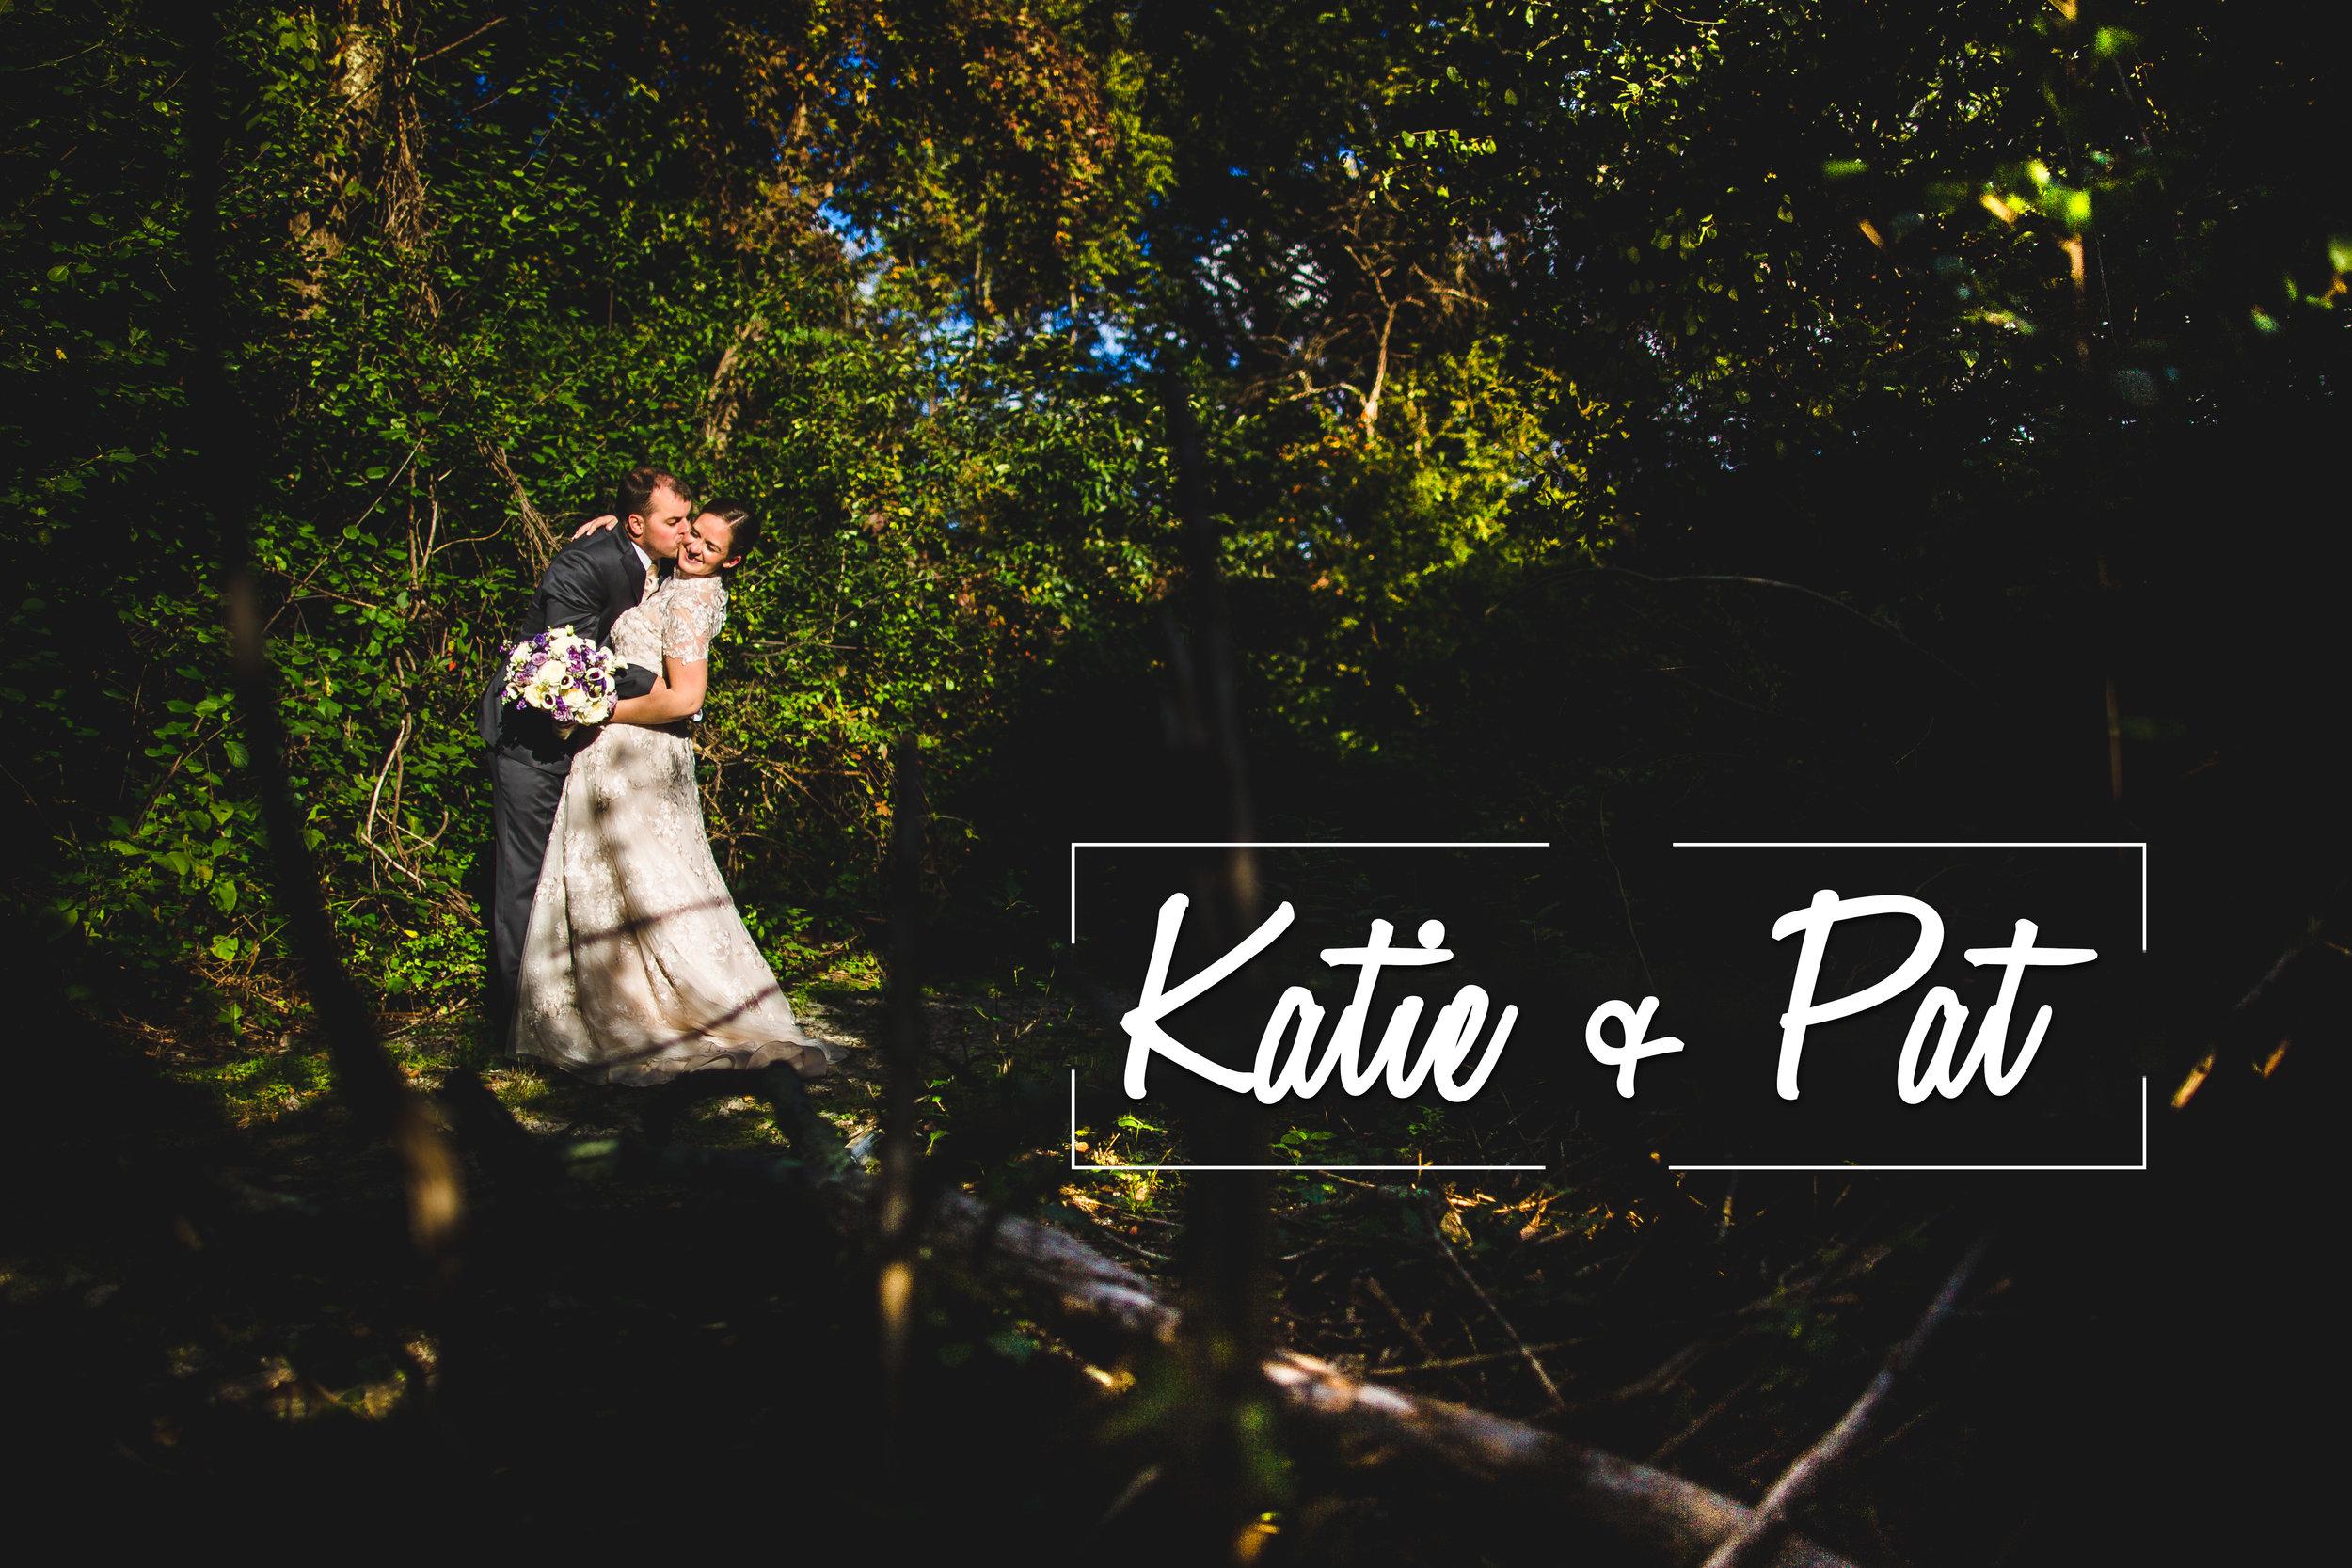 554-Katie&Pat_BLOGcouplessession-JCP18637 copy.jpg